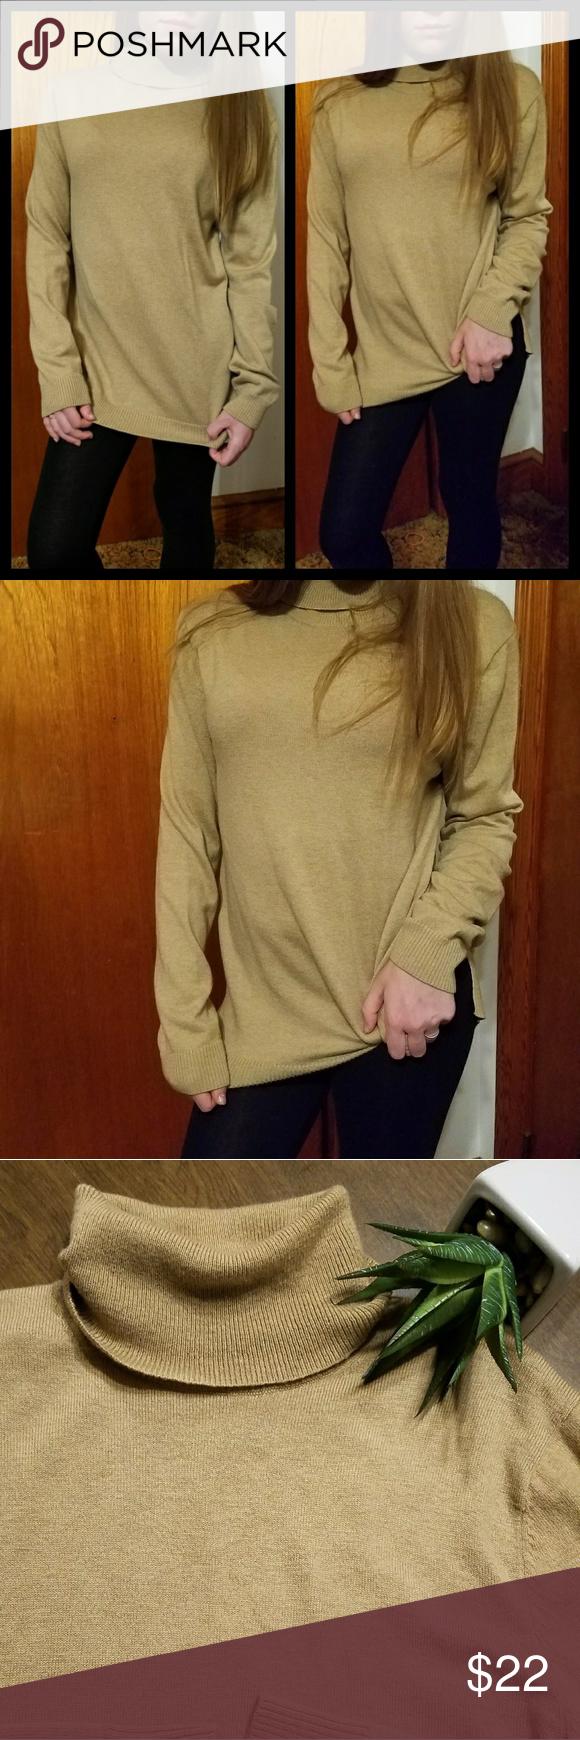 Light tan comfy turtleneck Gap sweater | Fall nights, Conditioning ...